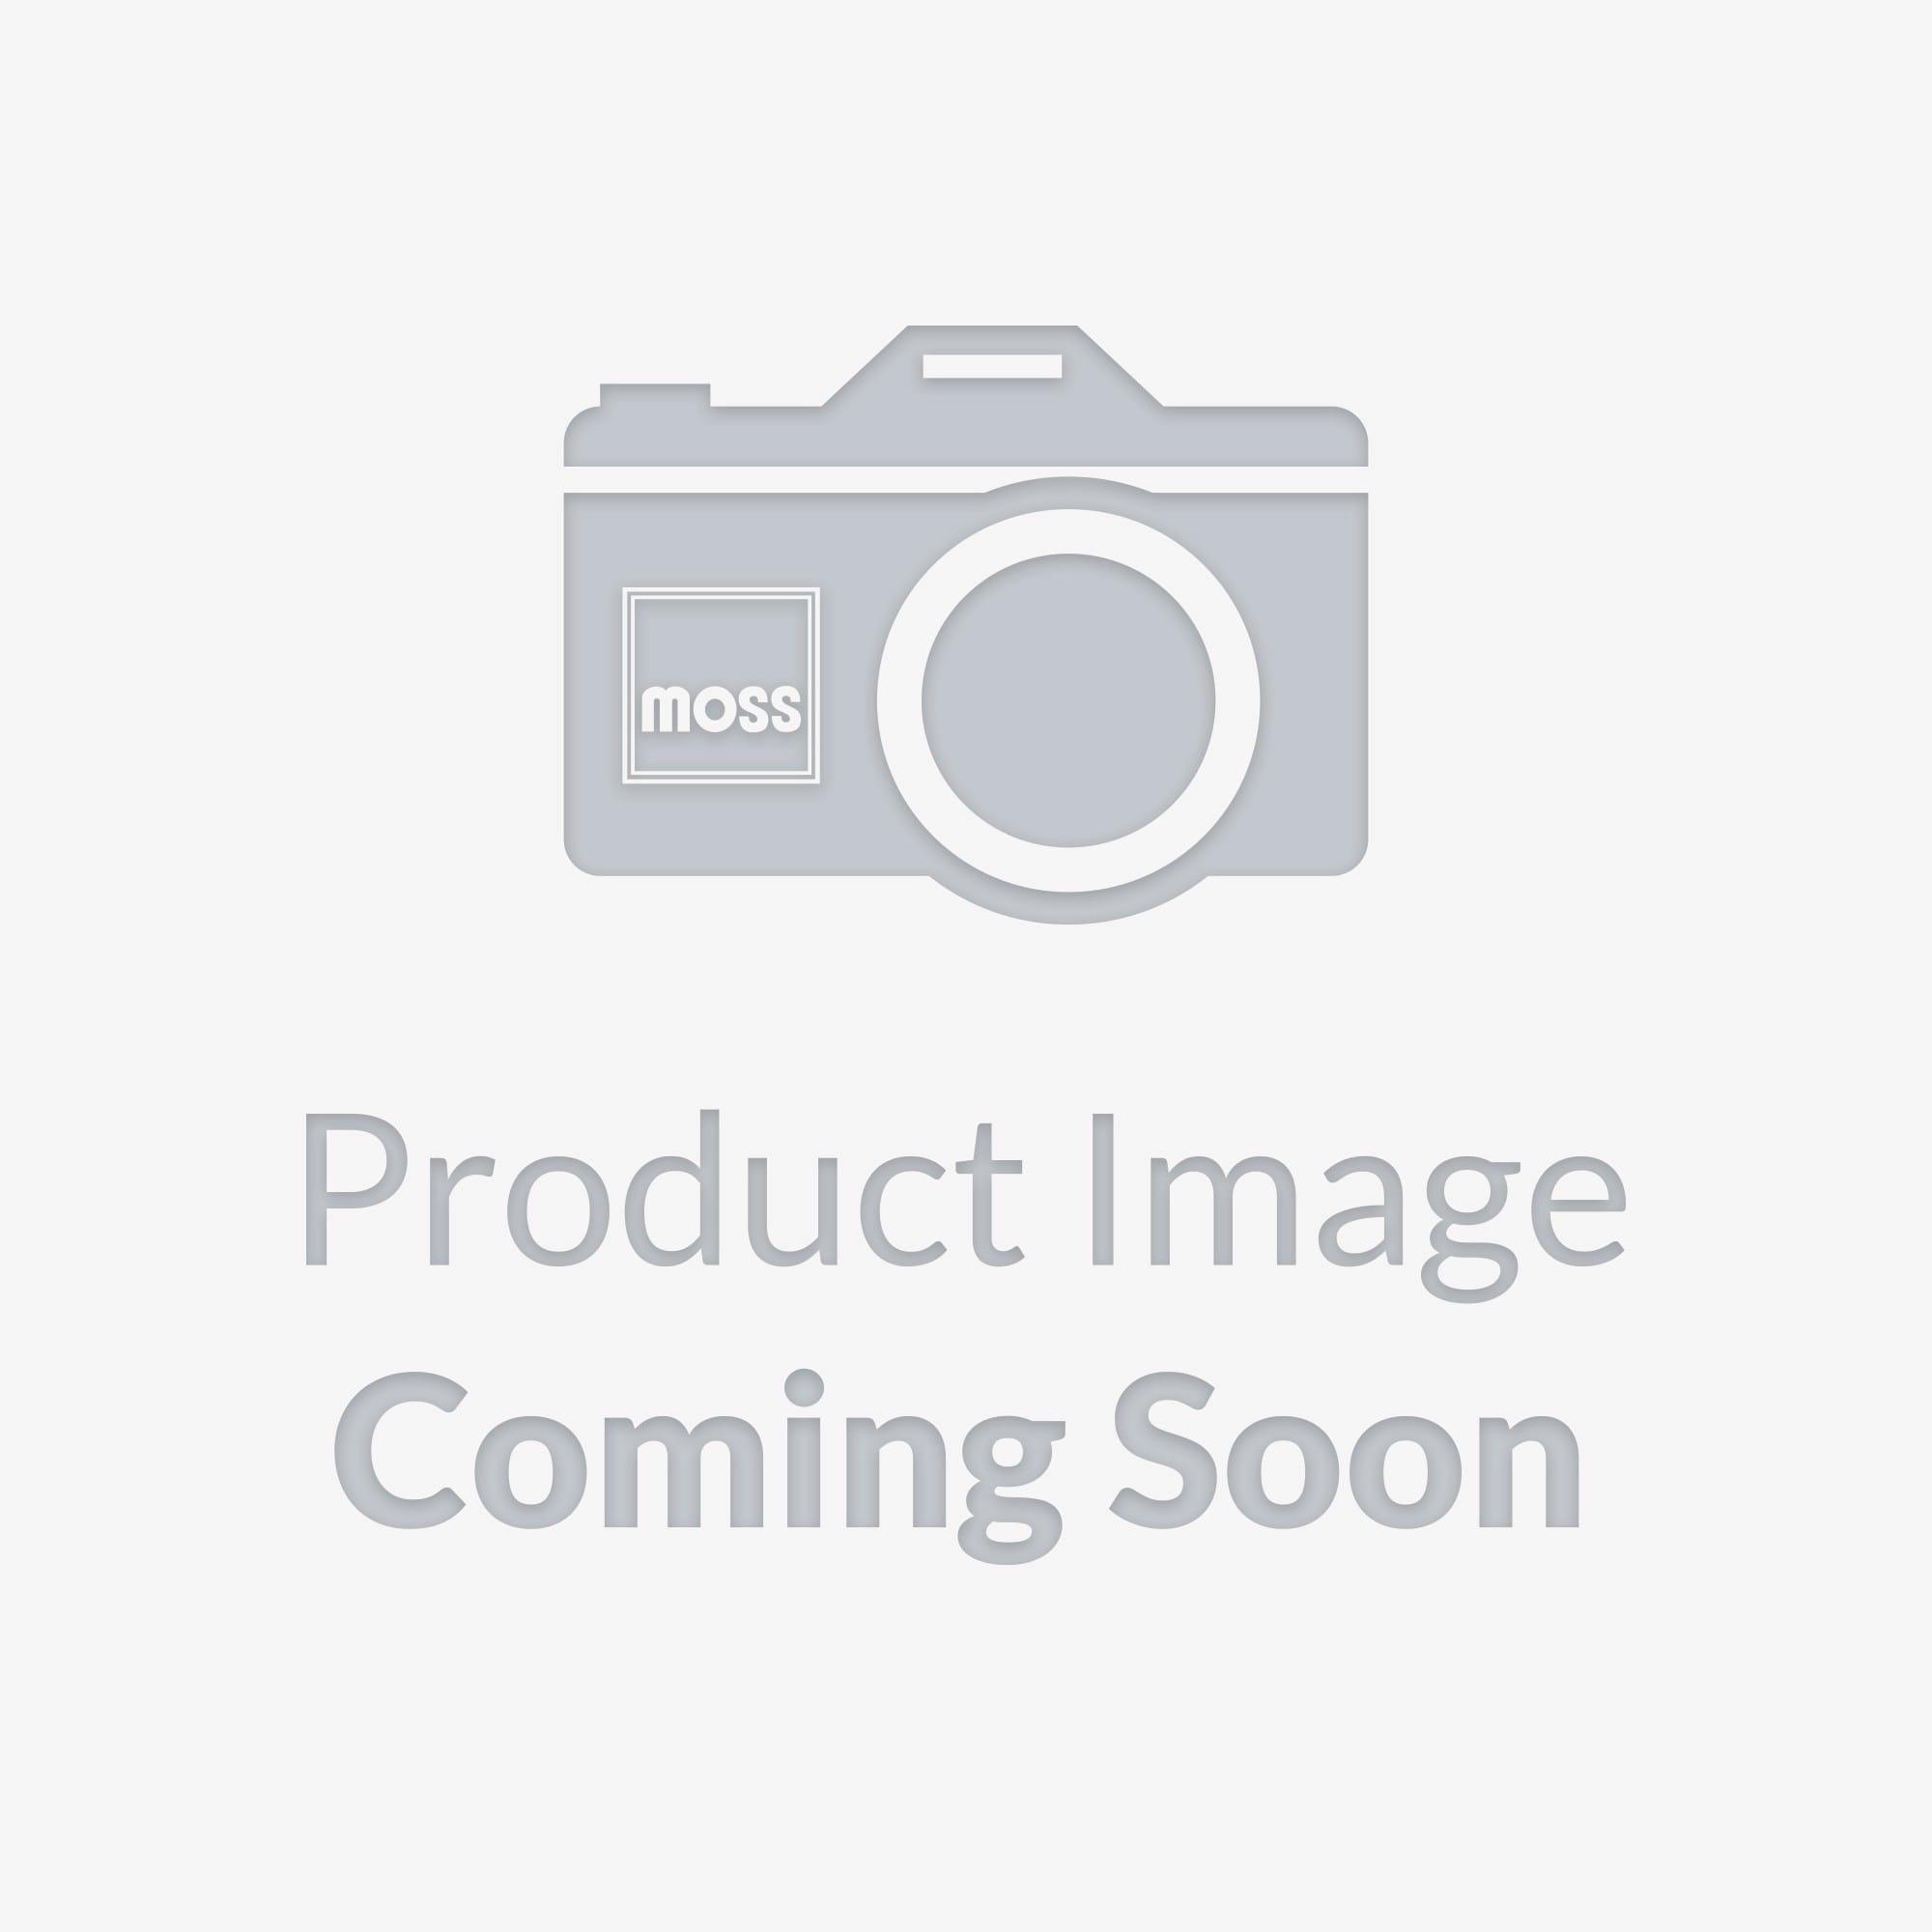 235 850 Oil Cooler Installation Kit Stainless Steel Hoses